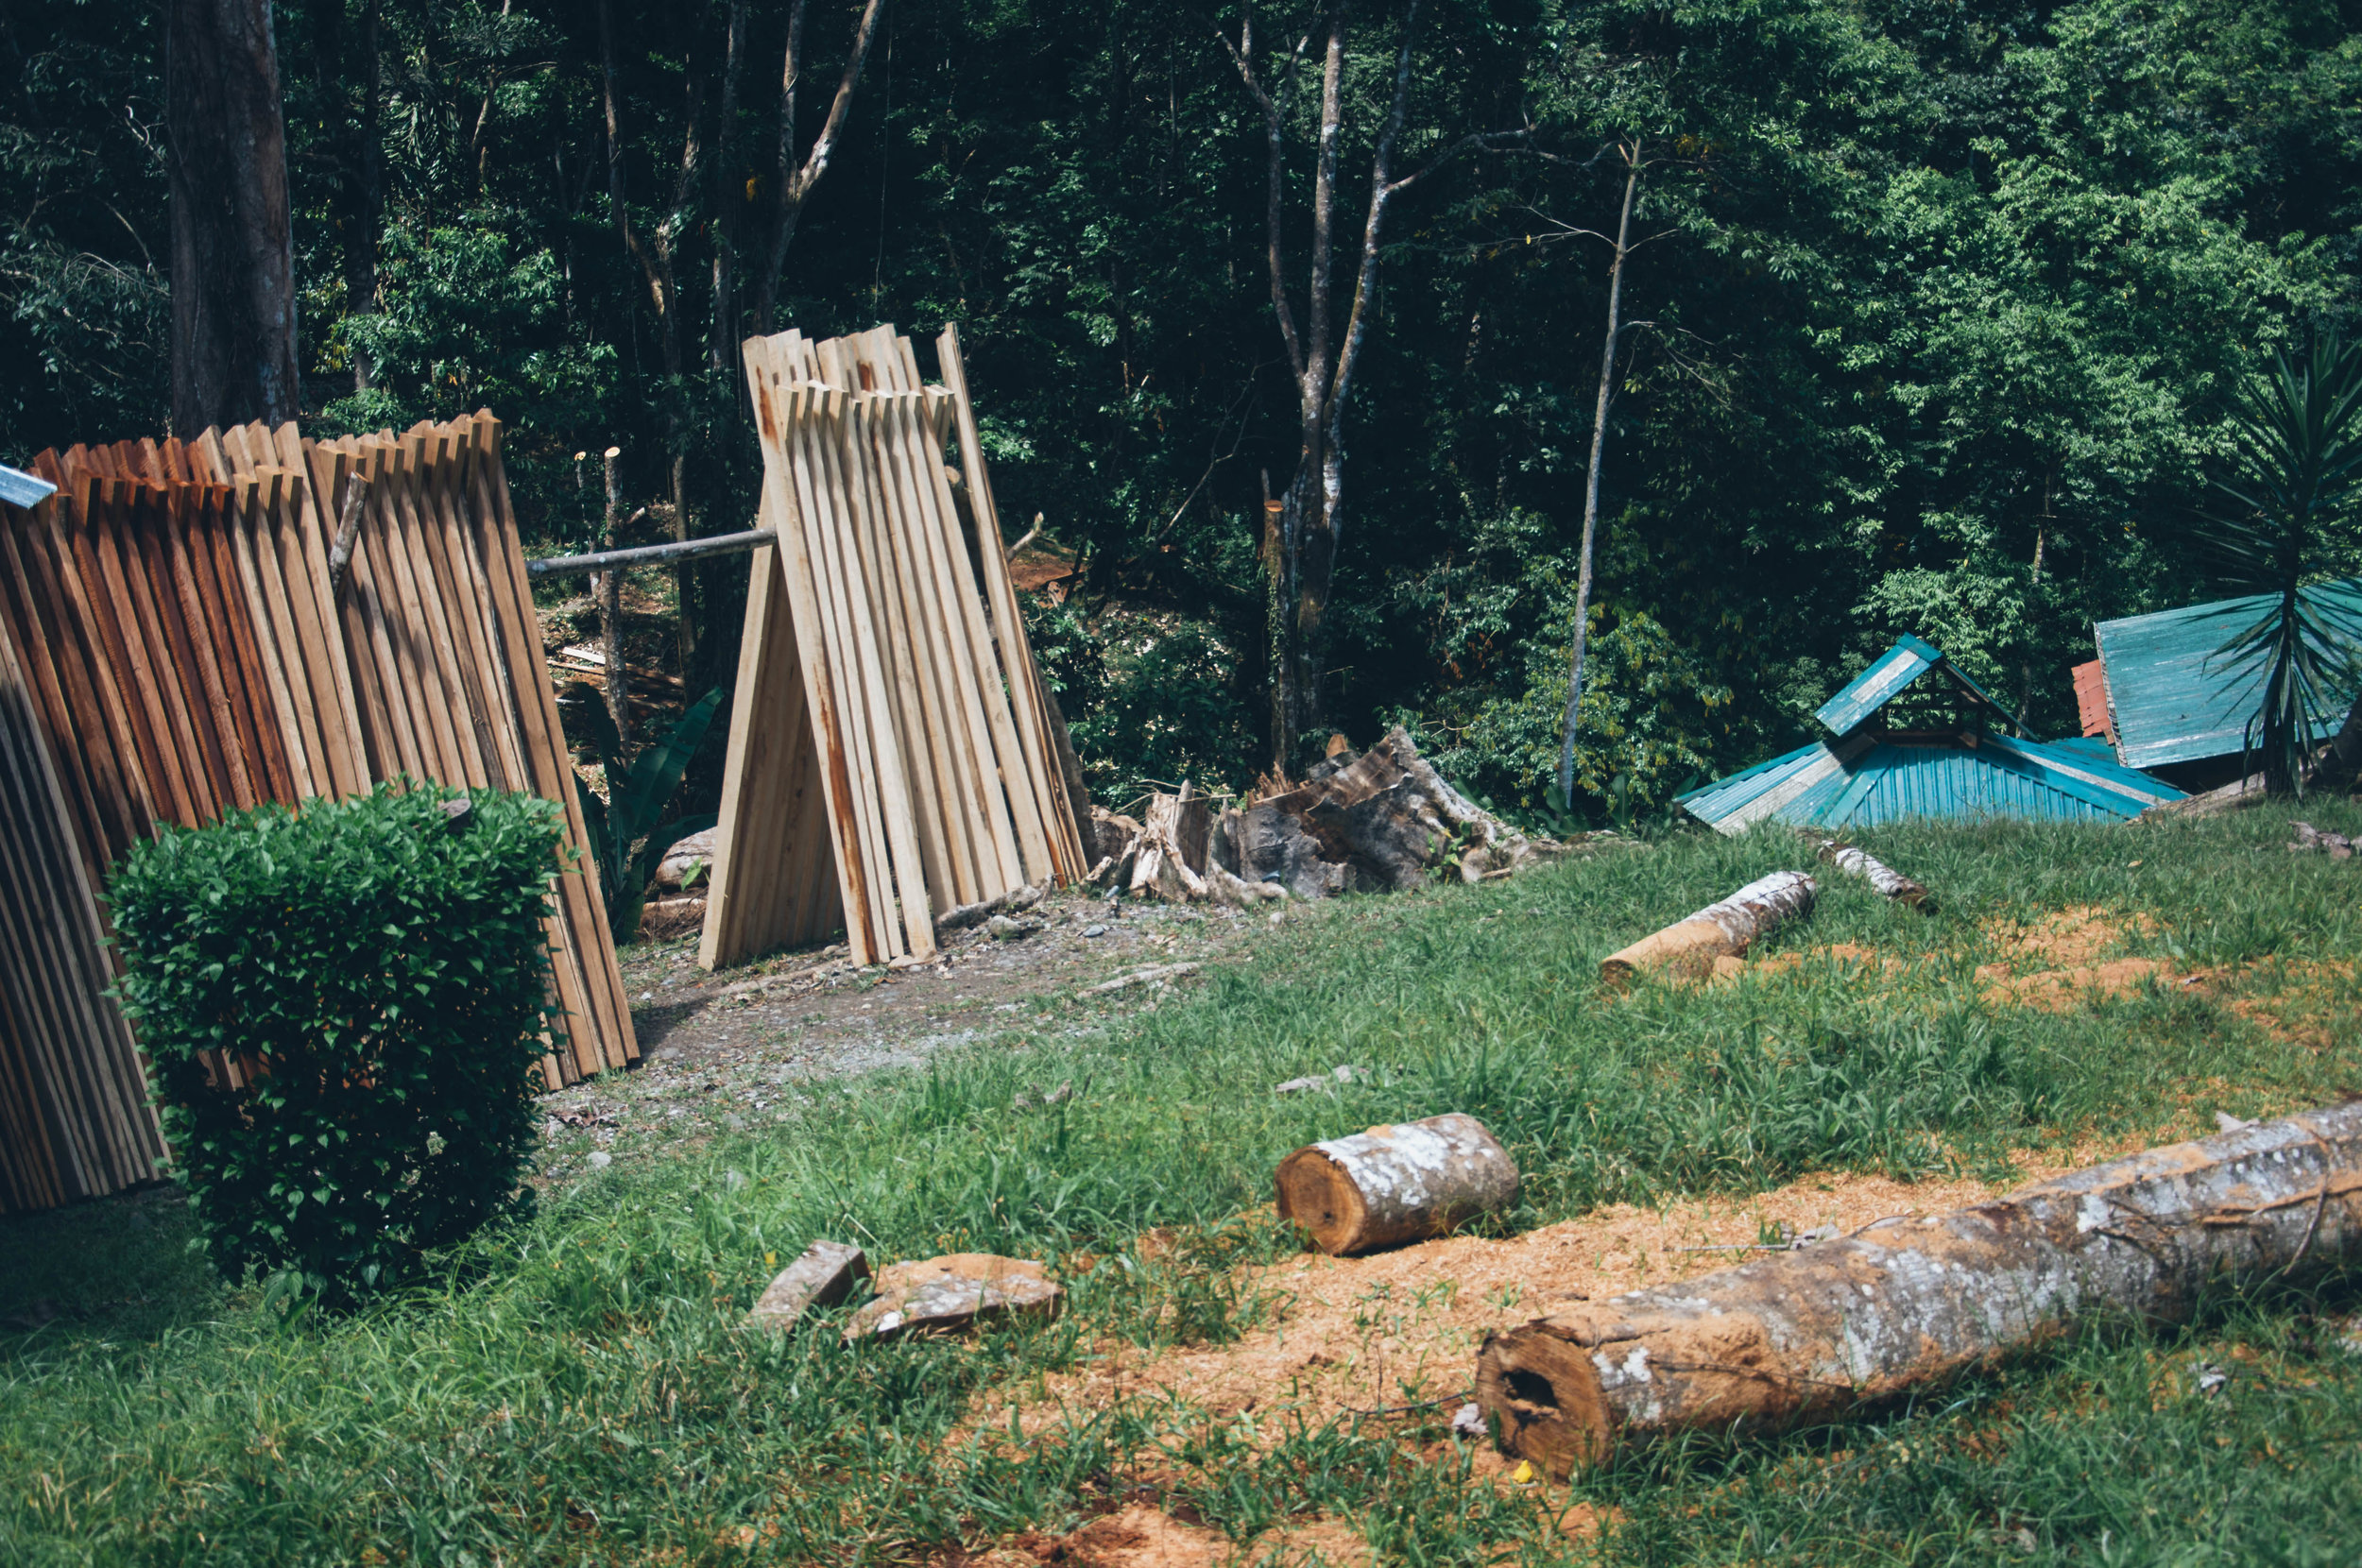 Tropical hardwoods of Laurel, Nispero, Ahoche & Amarillion